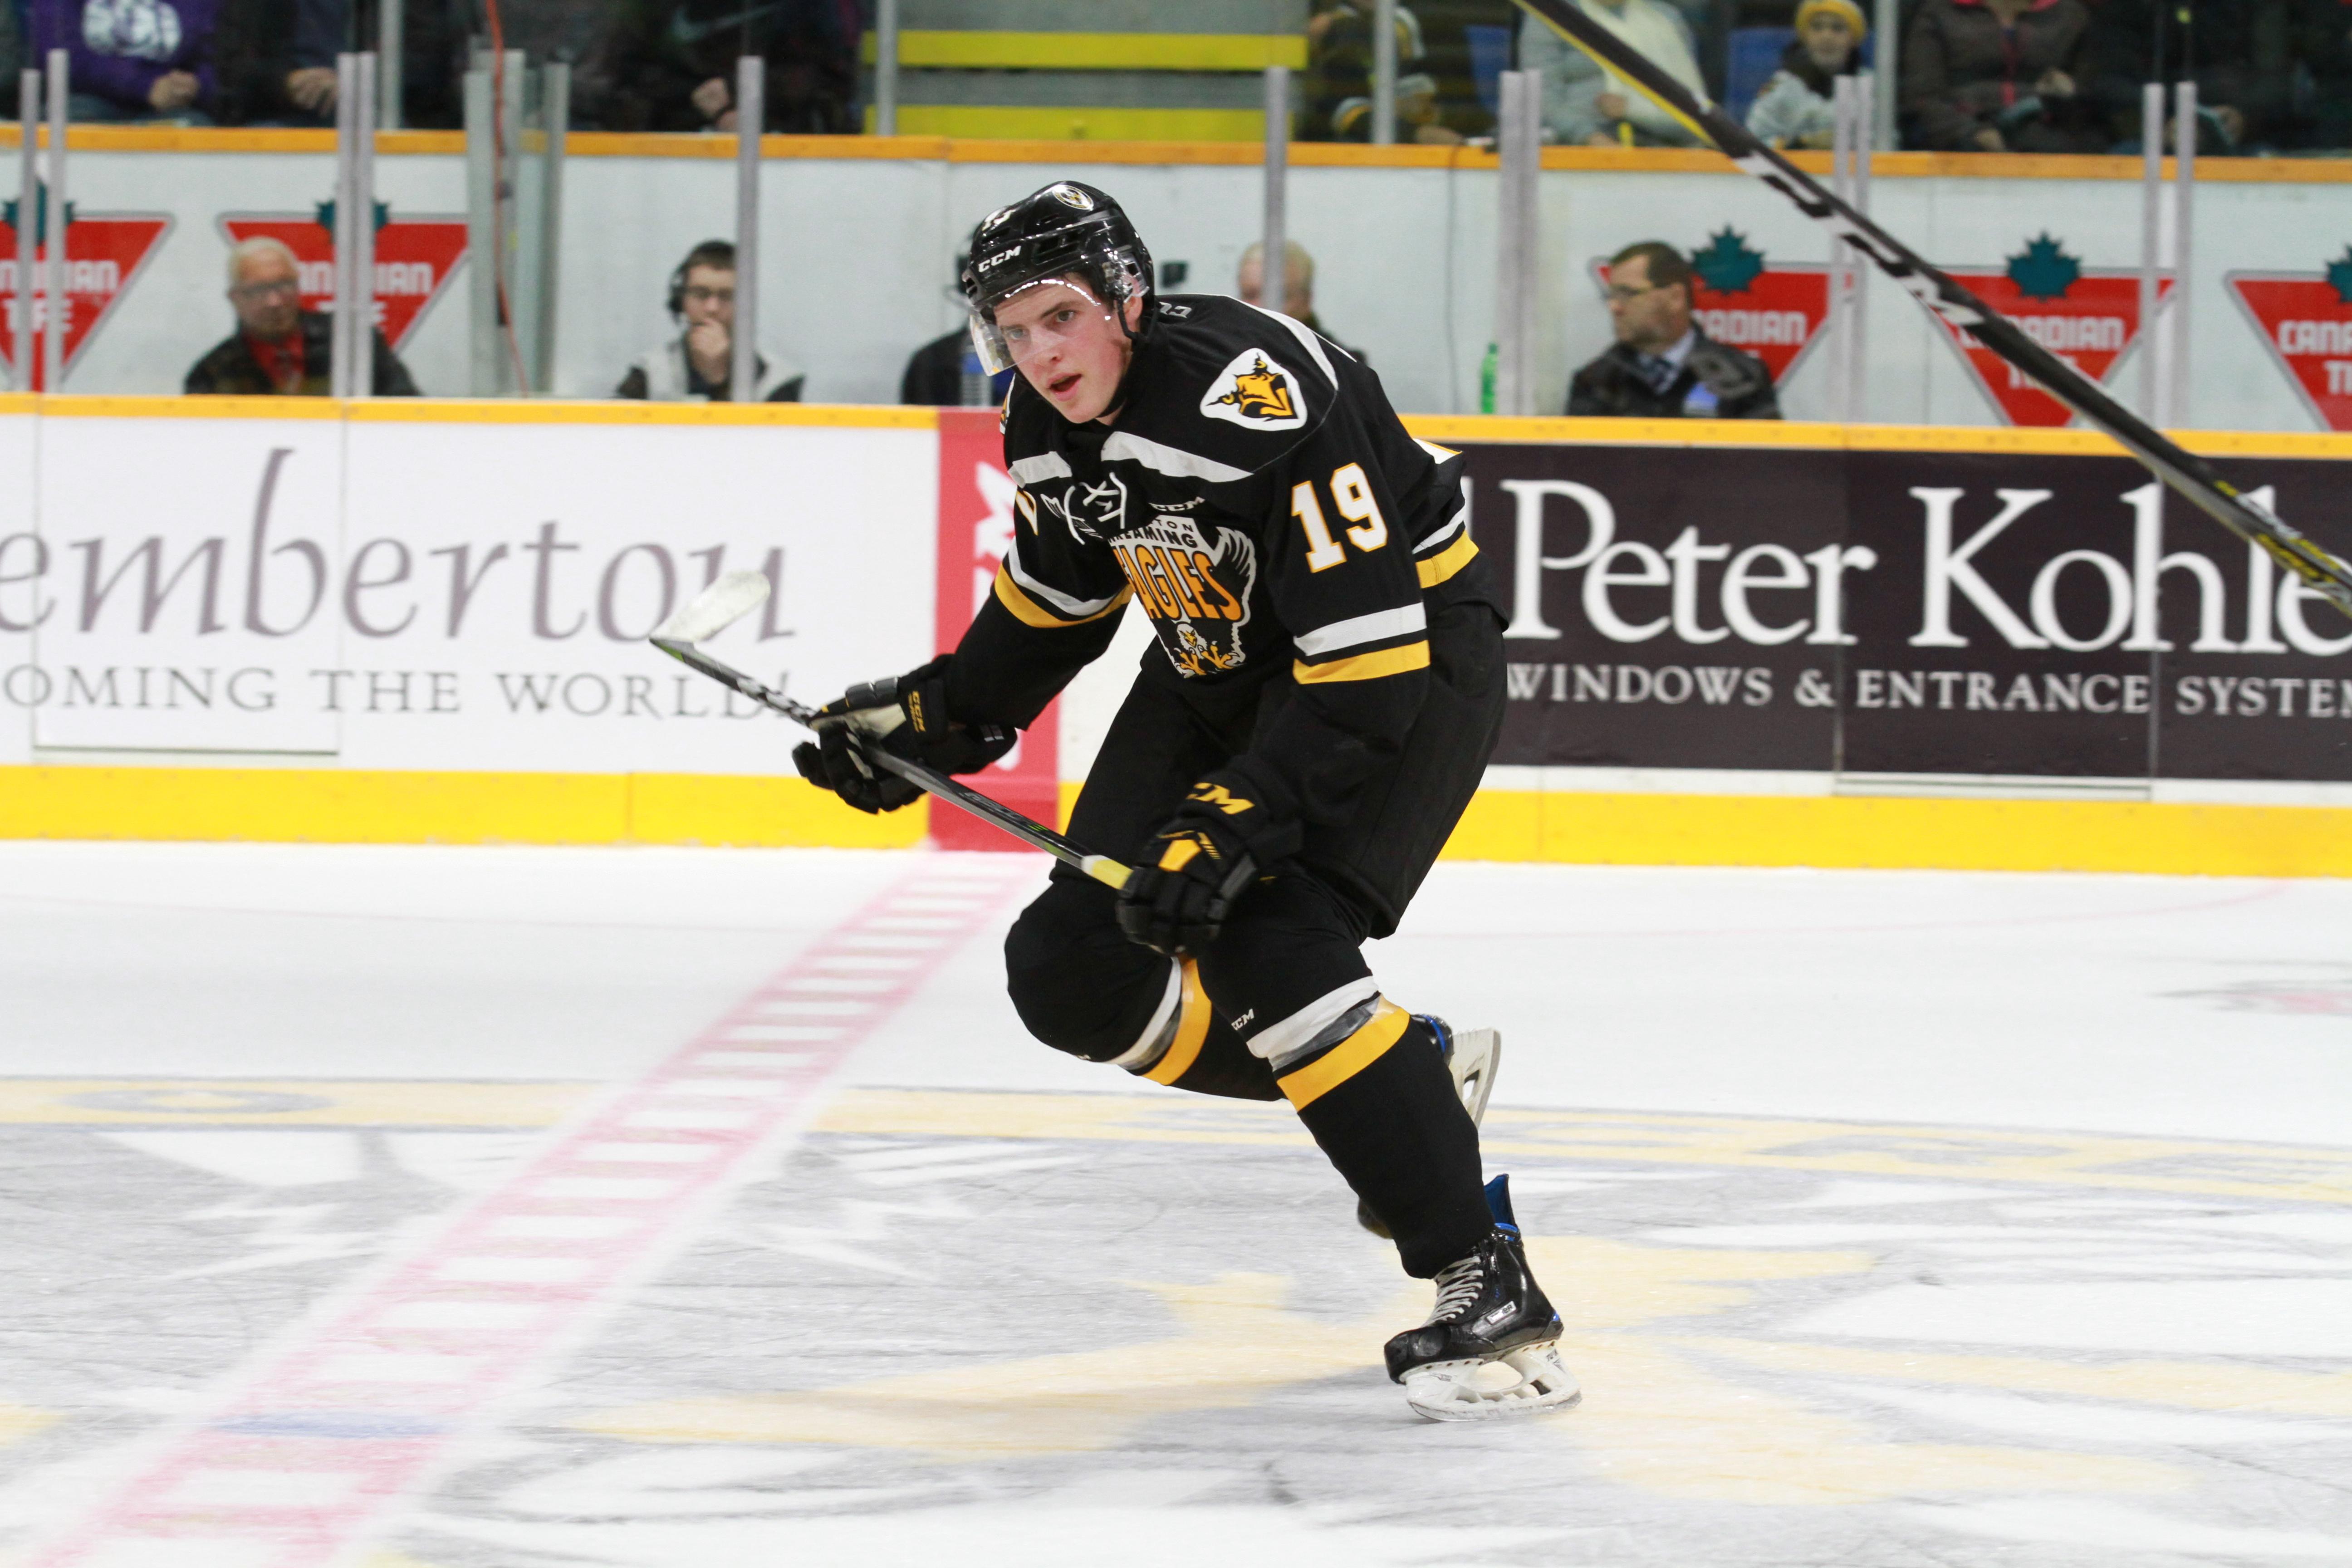 QMJHL: Notebook - Team Canada's Small QMJHL Pool Speaks To Larger Problem